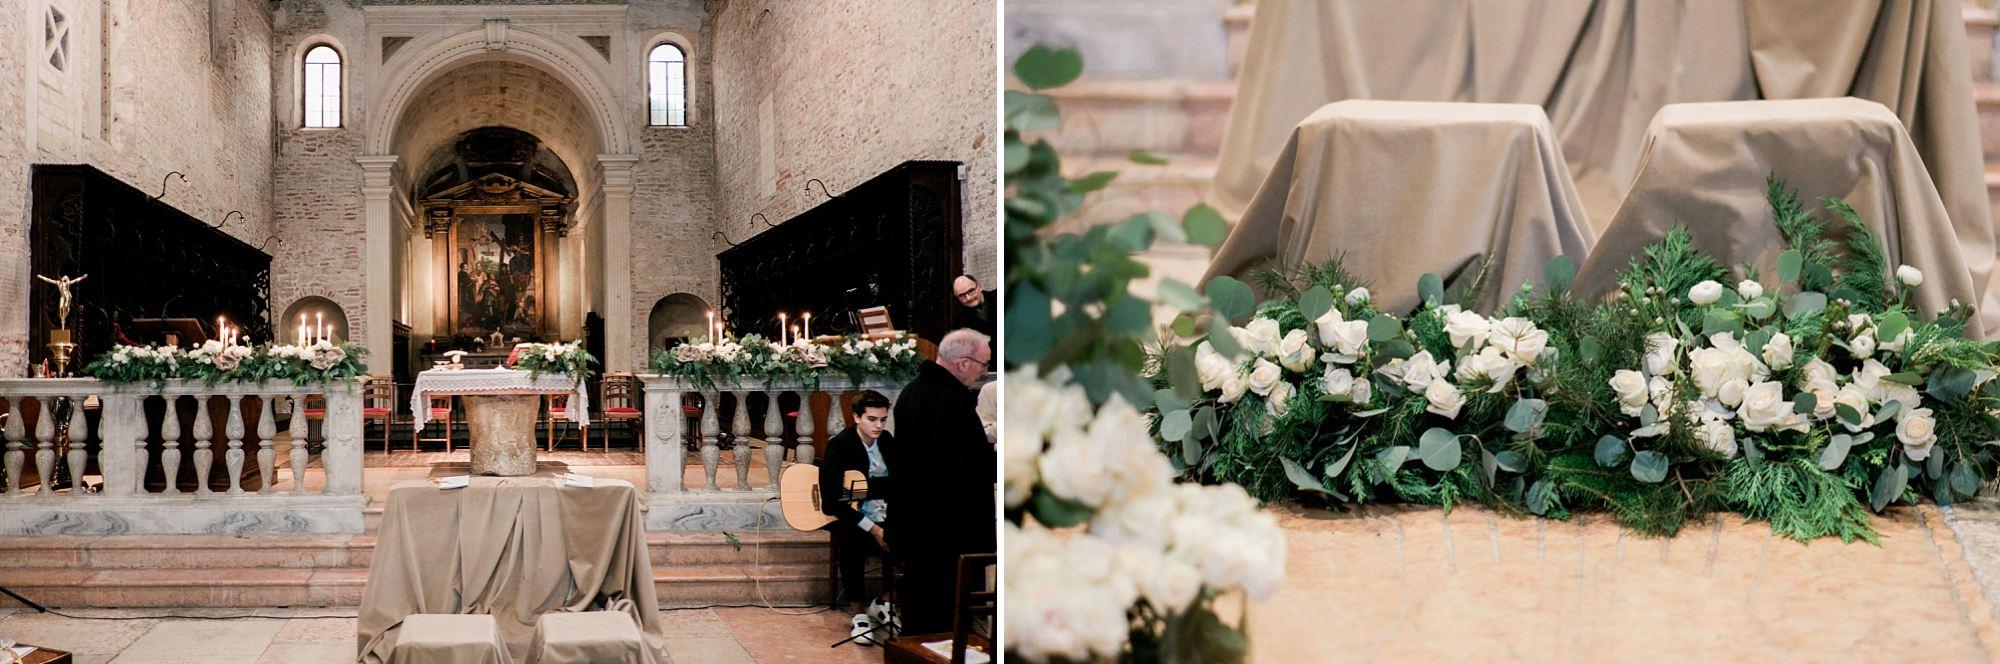 Christmas wedding in Verona